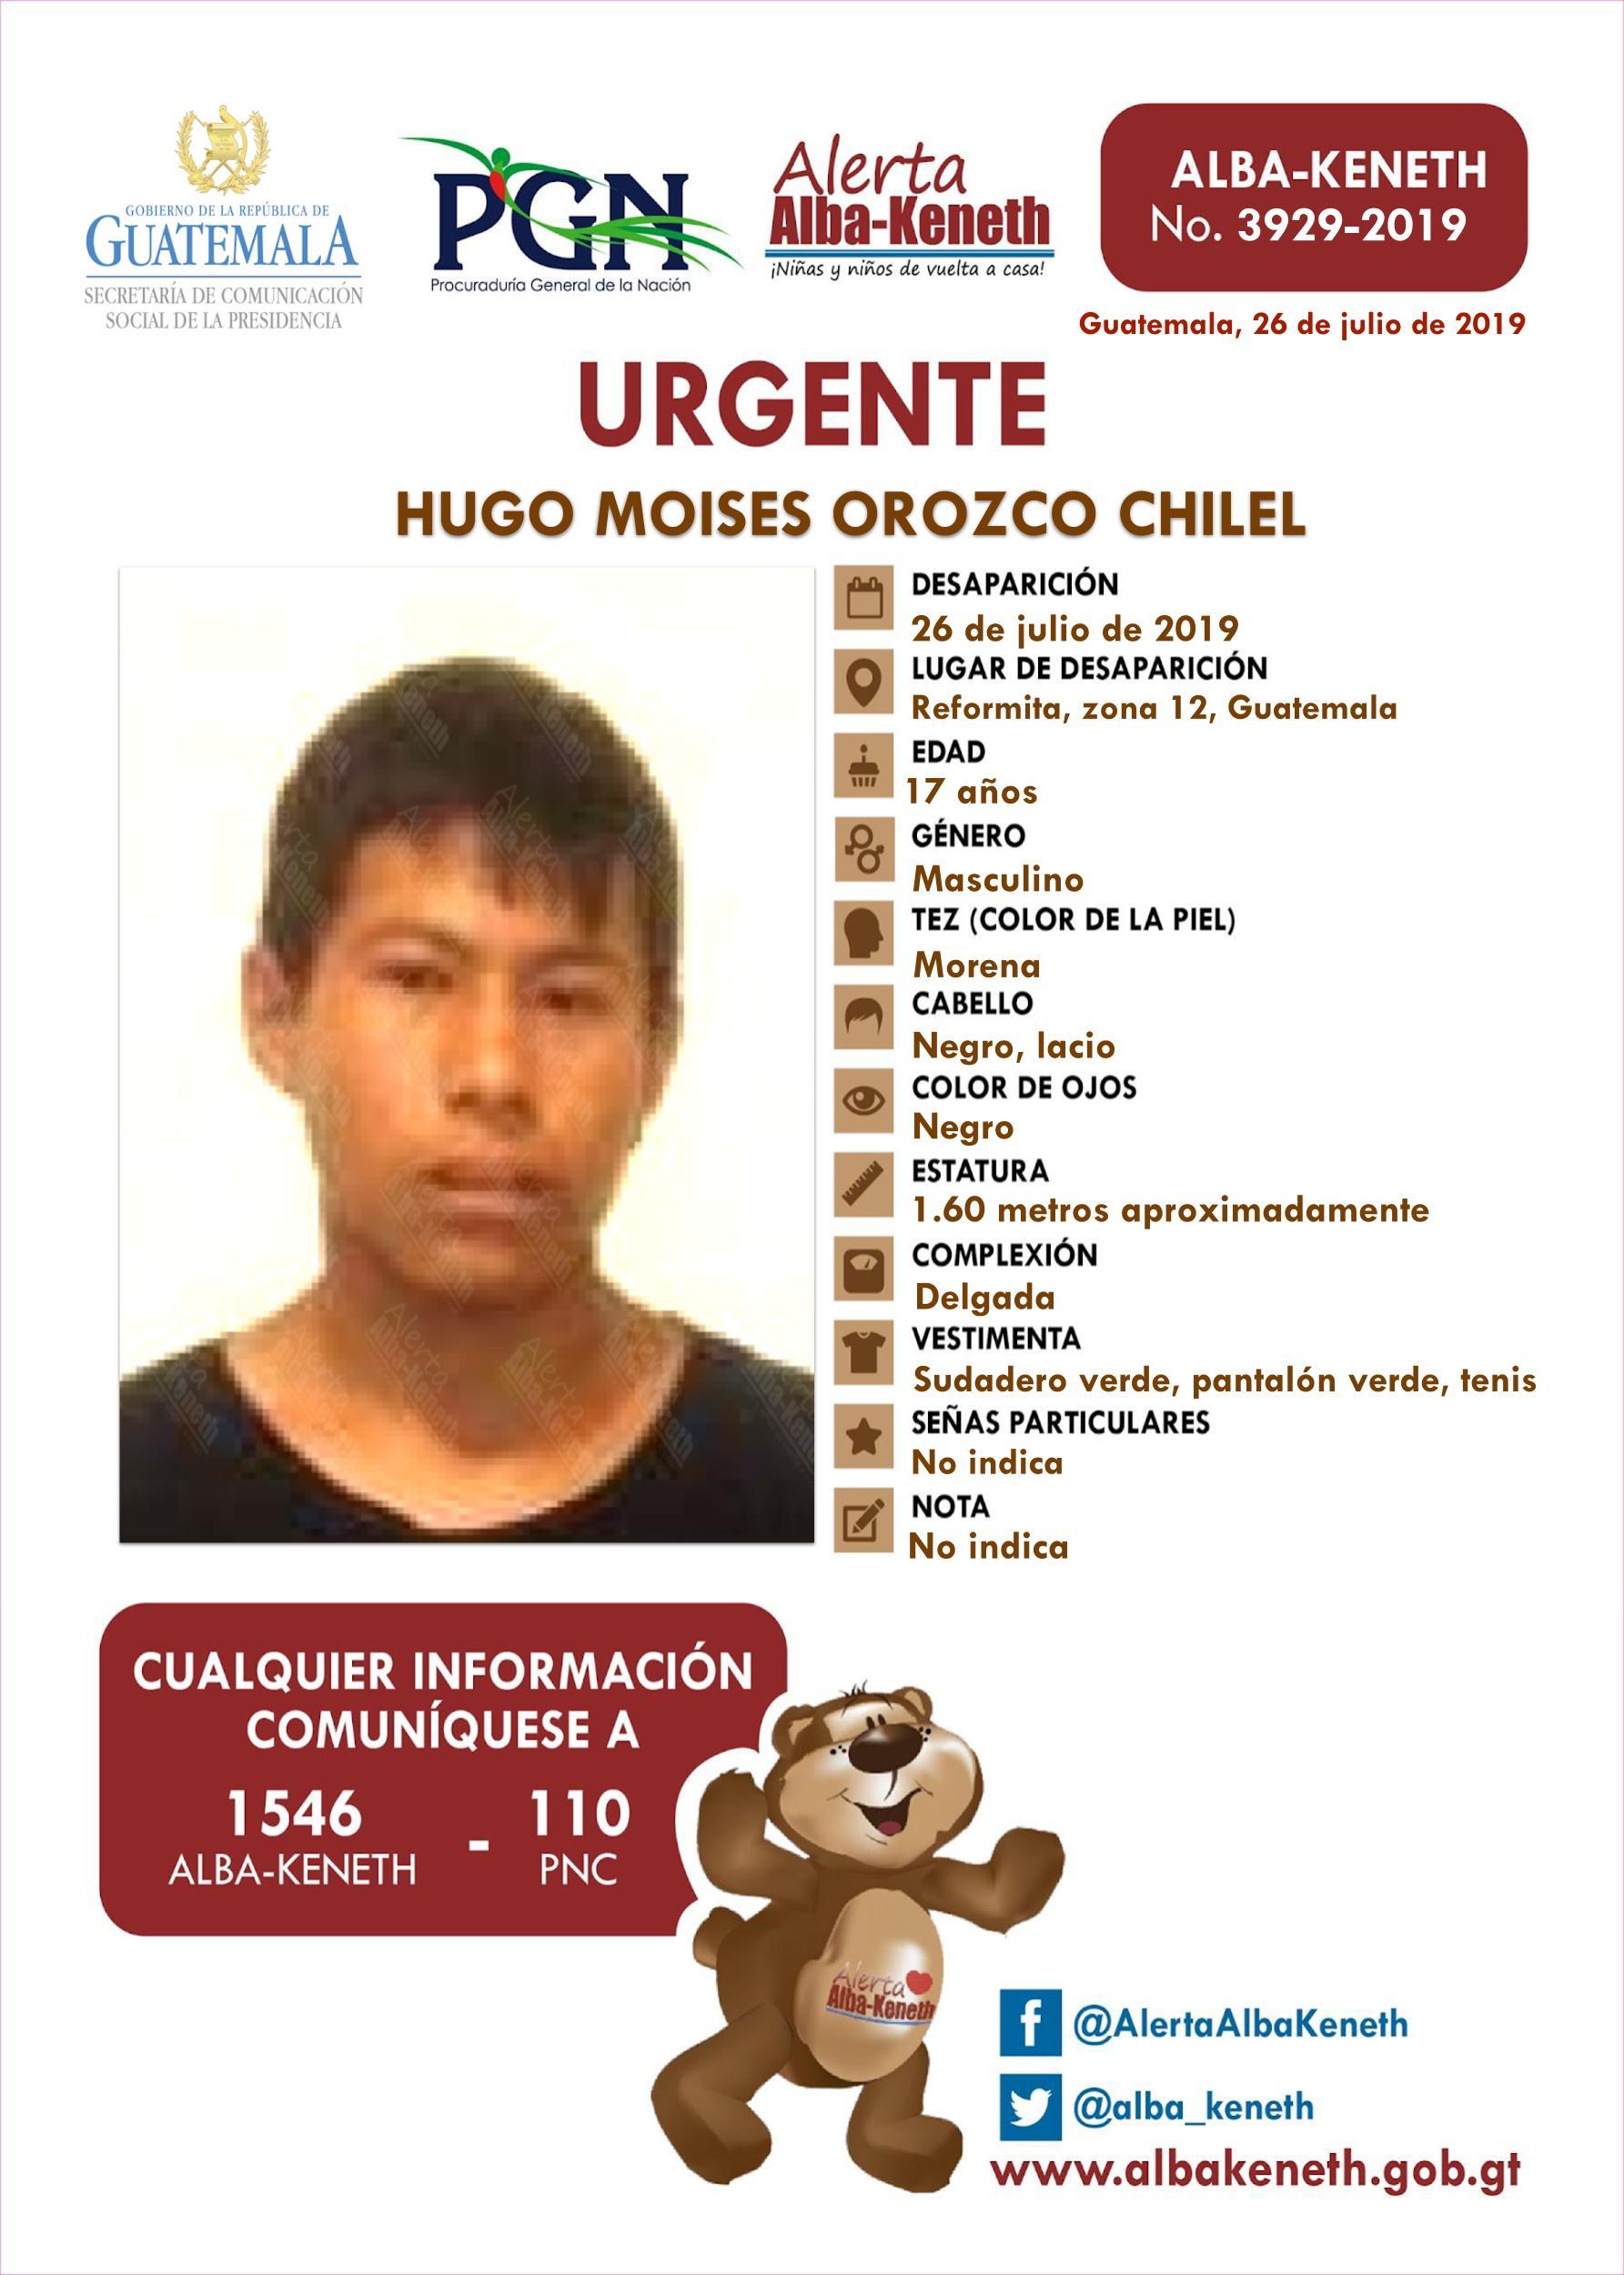 Hugo Moises Orozco Chilel